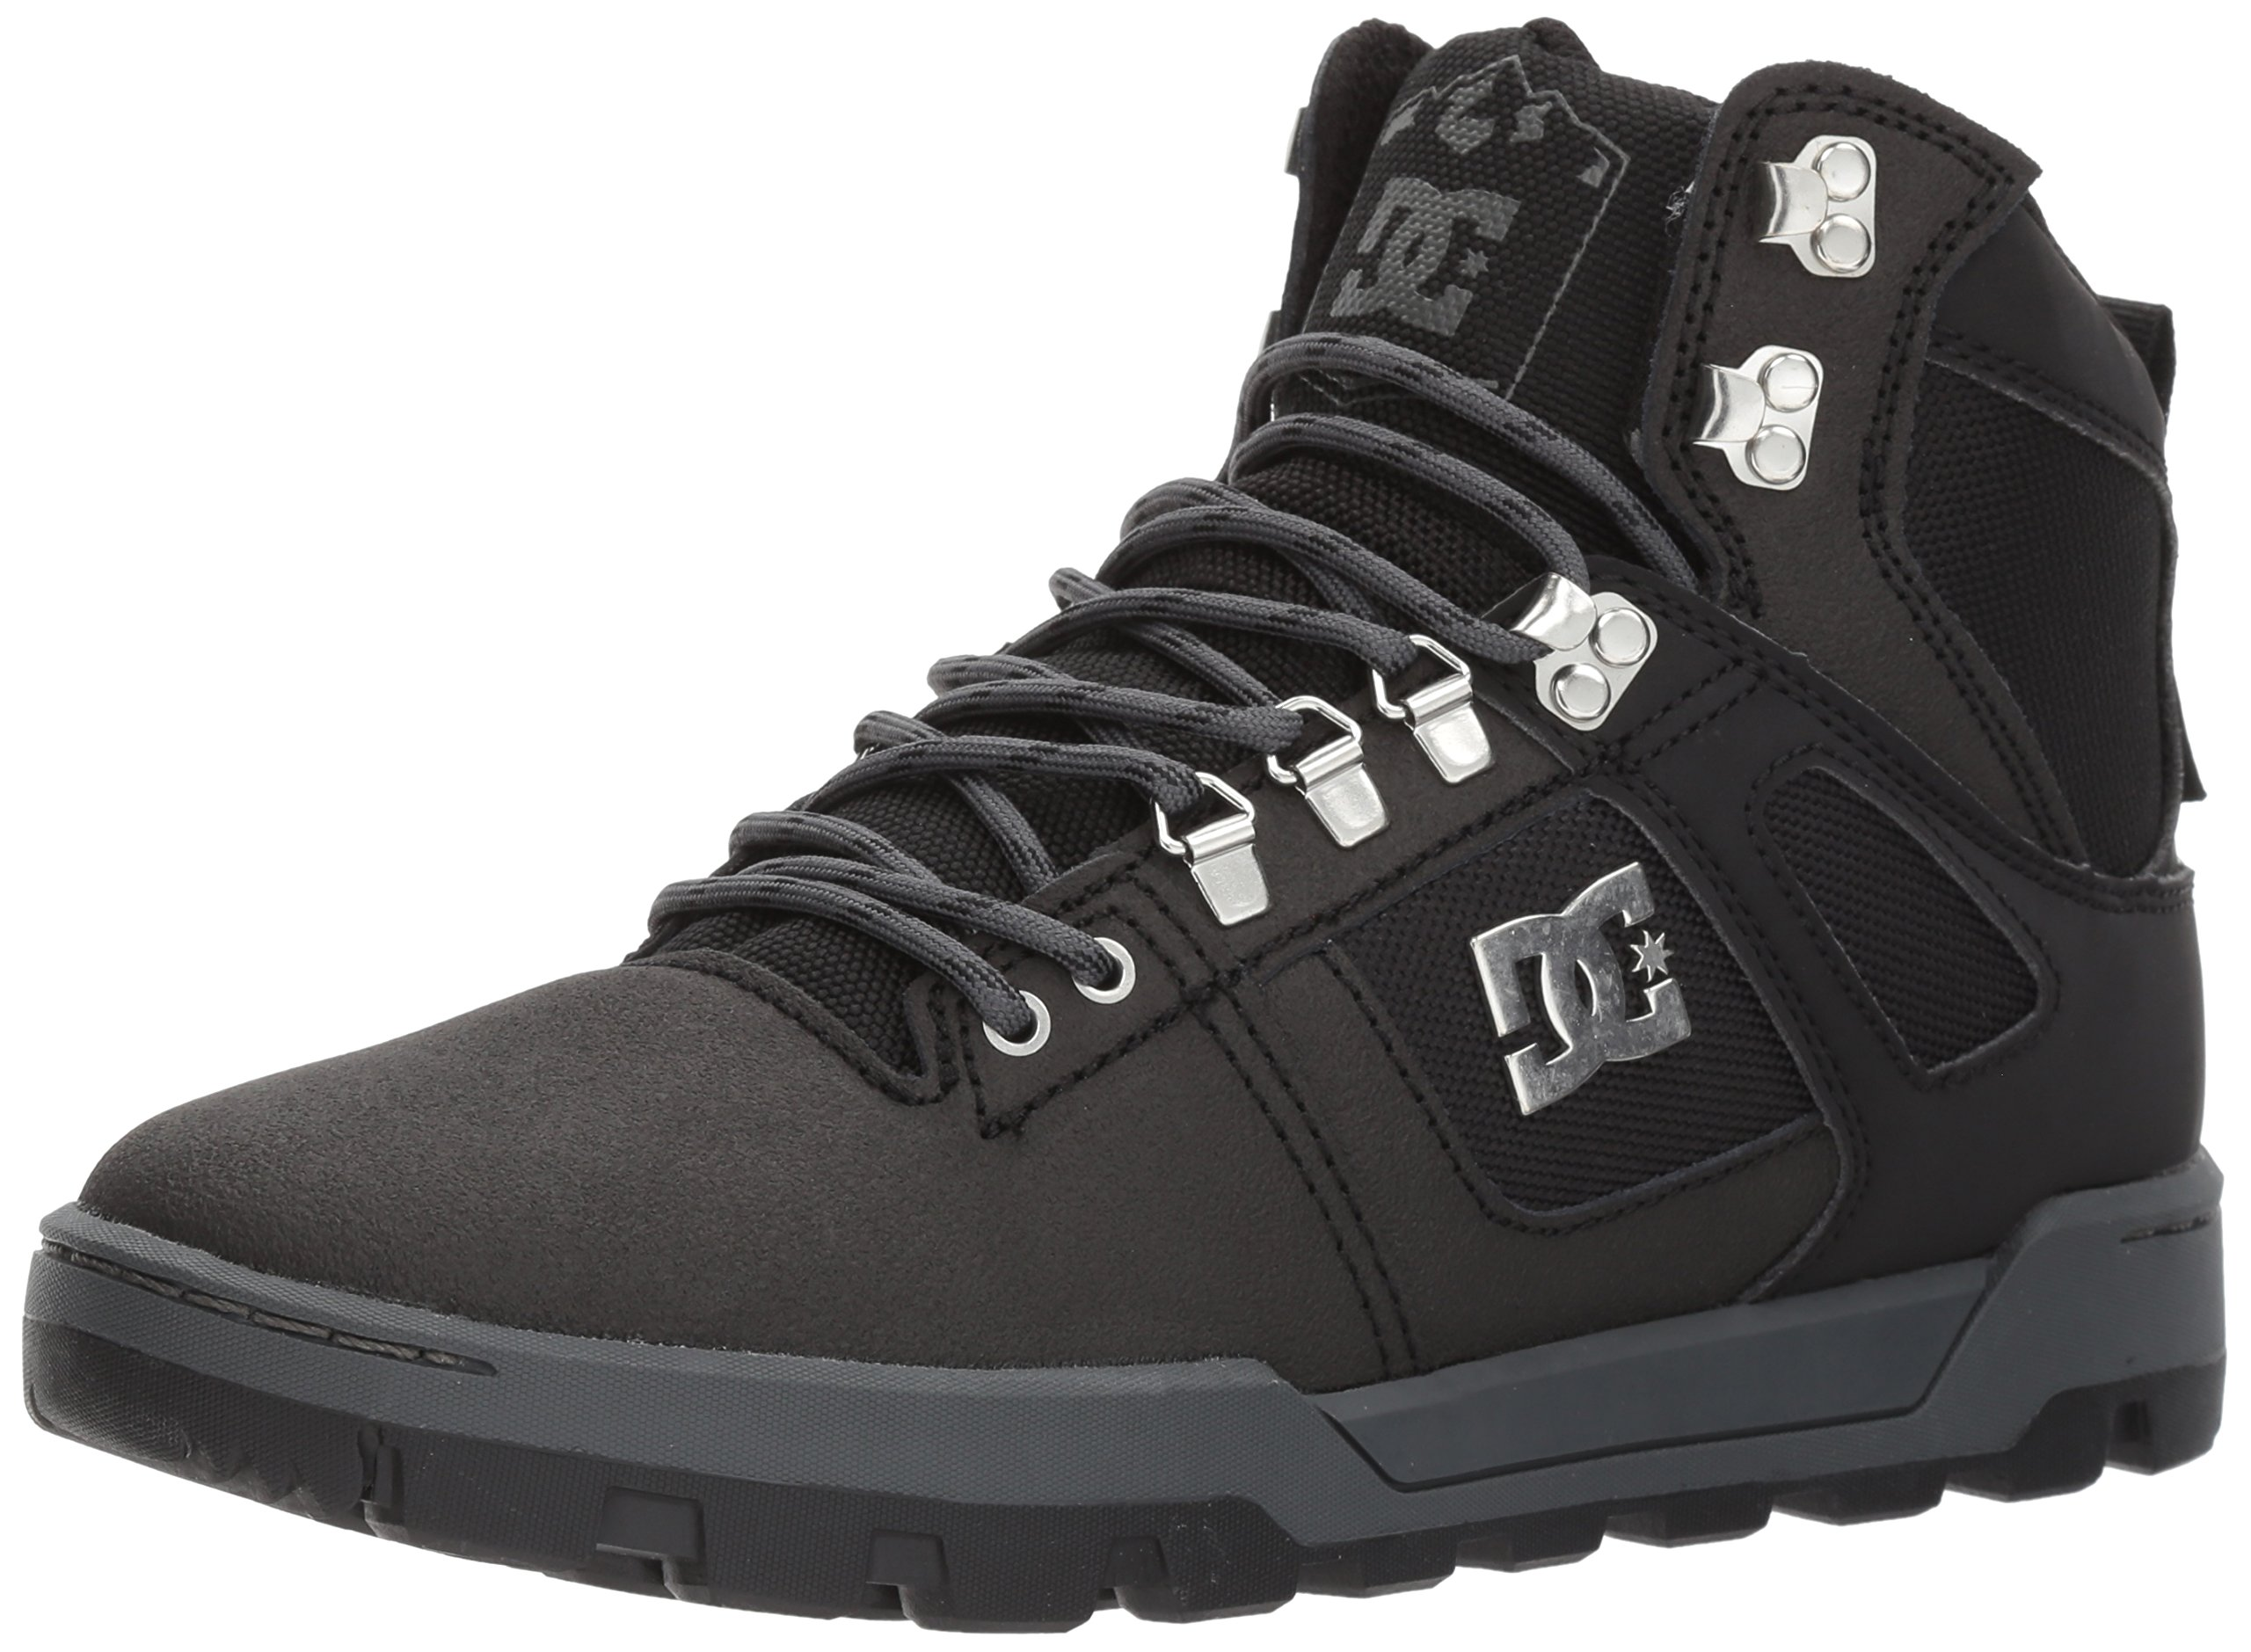 DC Men's Spartan High WR Boot, Black/Black/Dark Grey, 11.5D D US